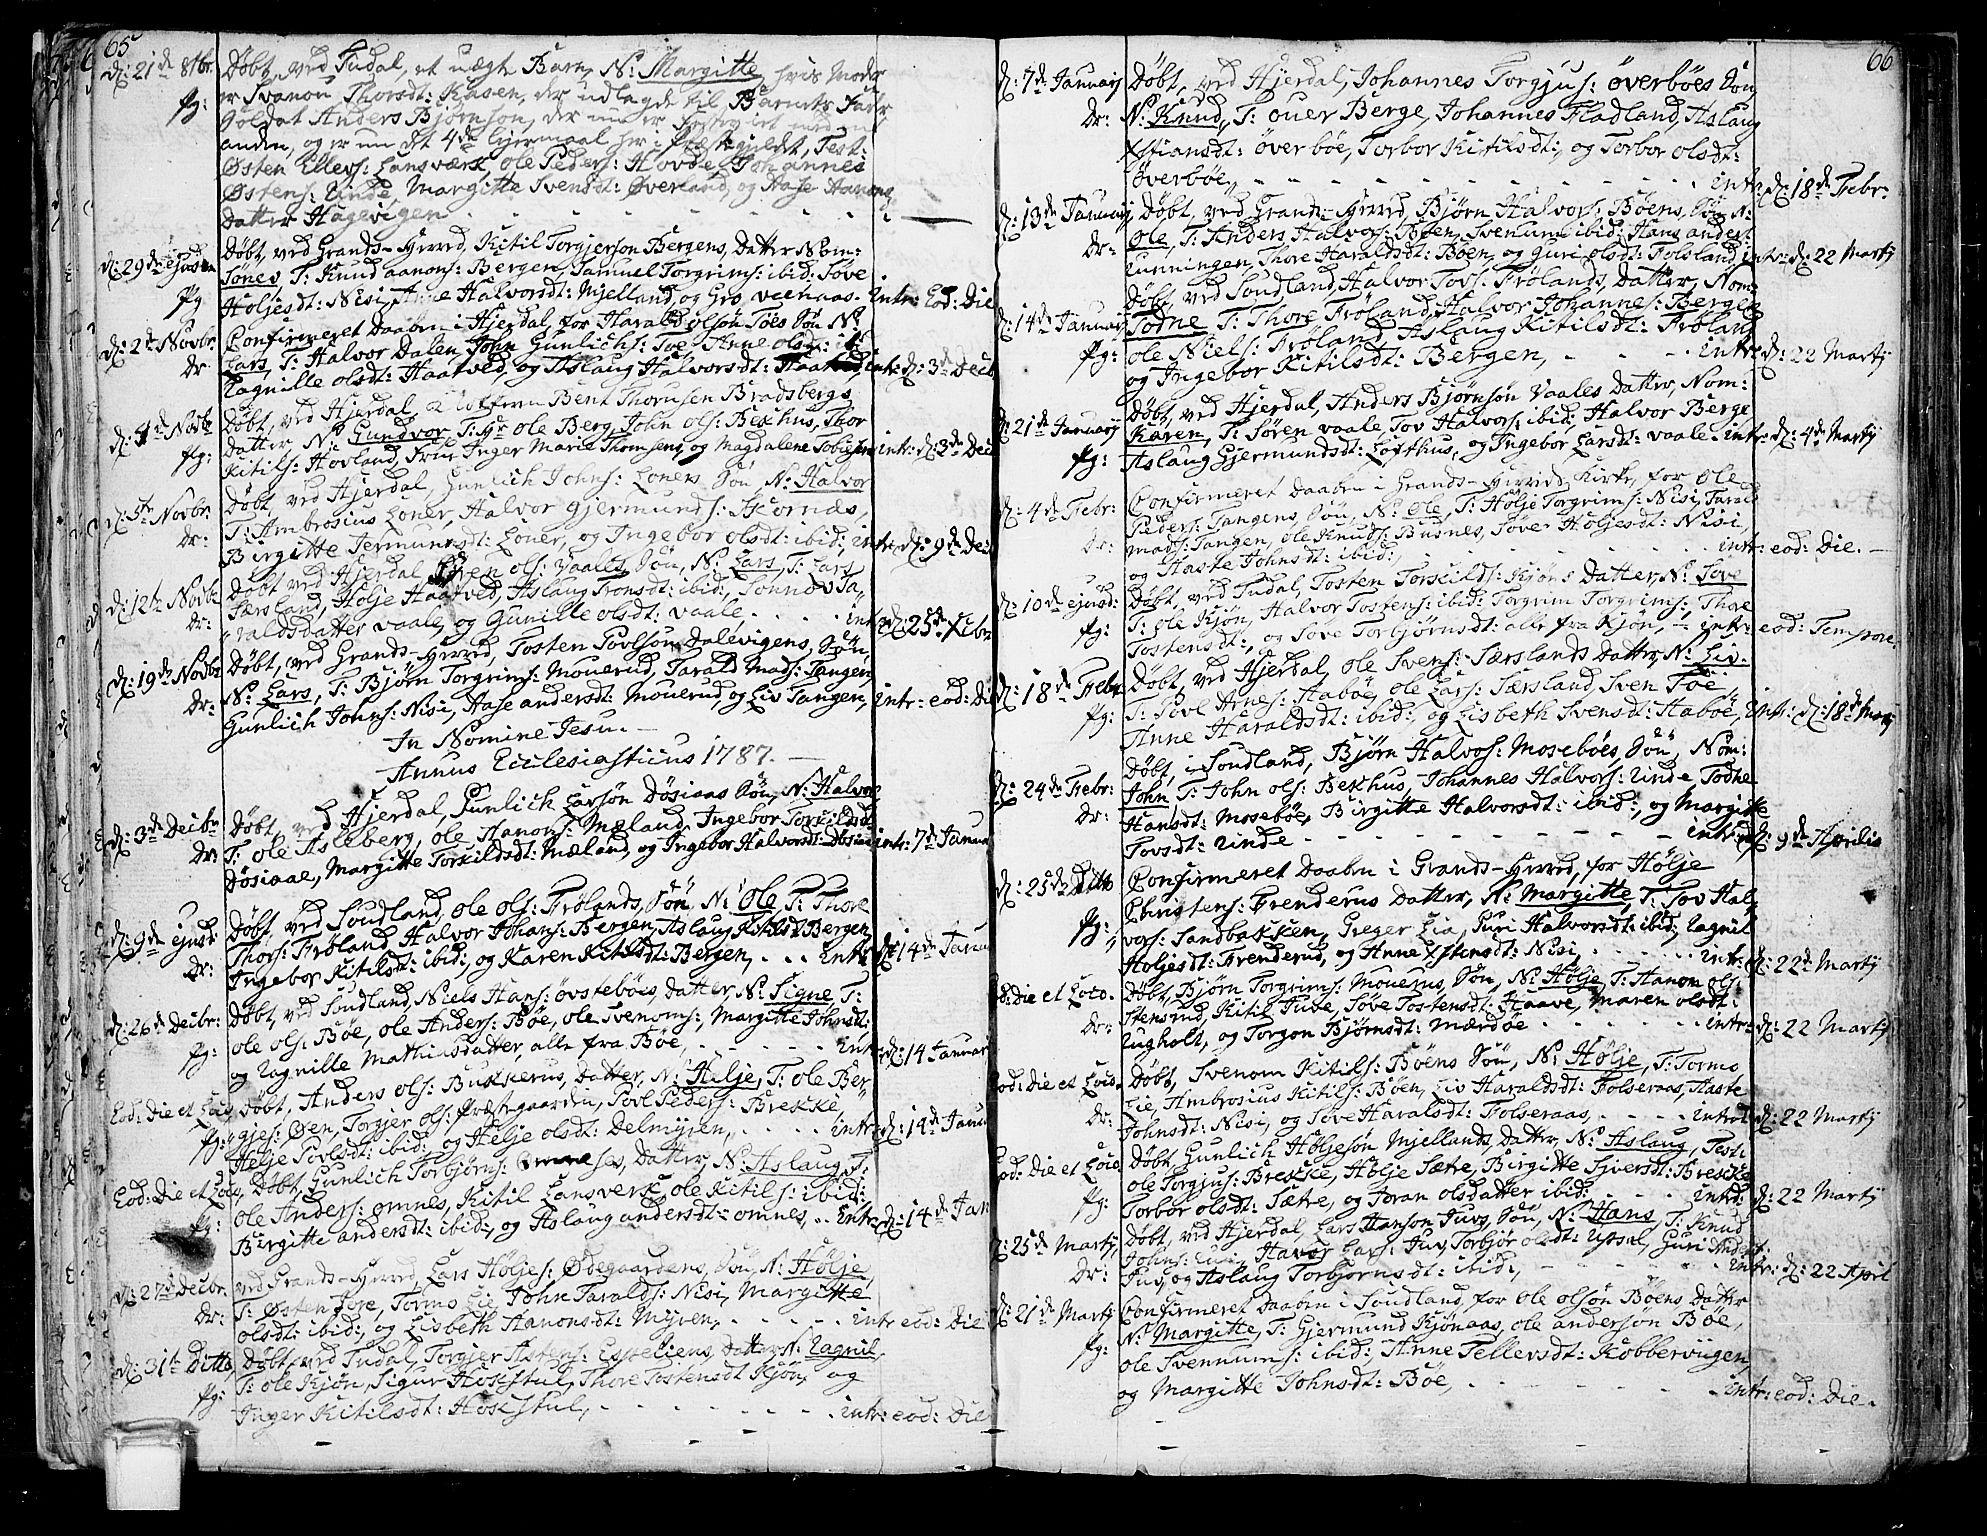 SAKO, Hjartdal kirkebøker, F/Fa/L0005: Ministerialbok nr. I 5, 1776-1801, s. 65-66